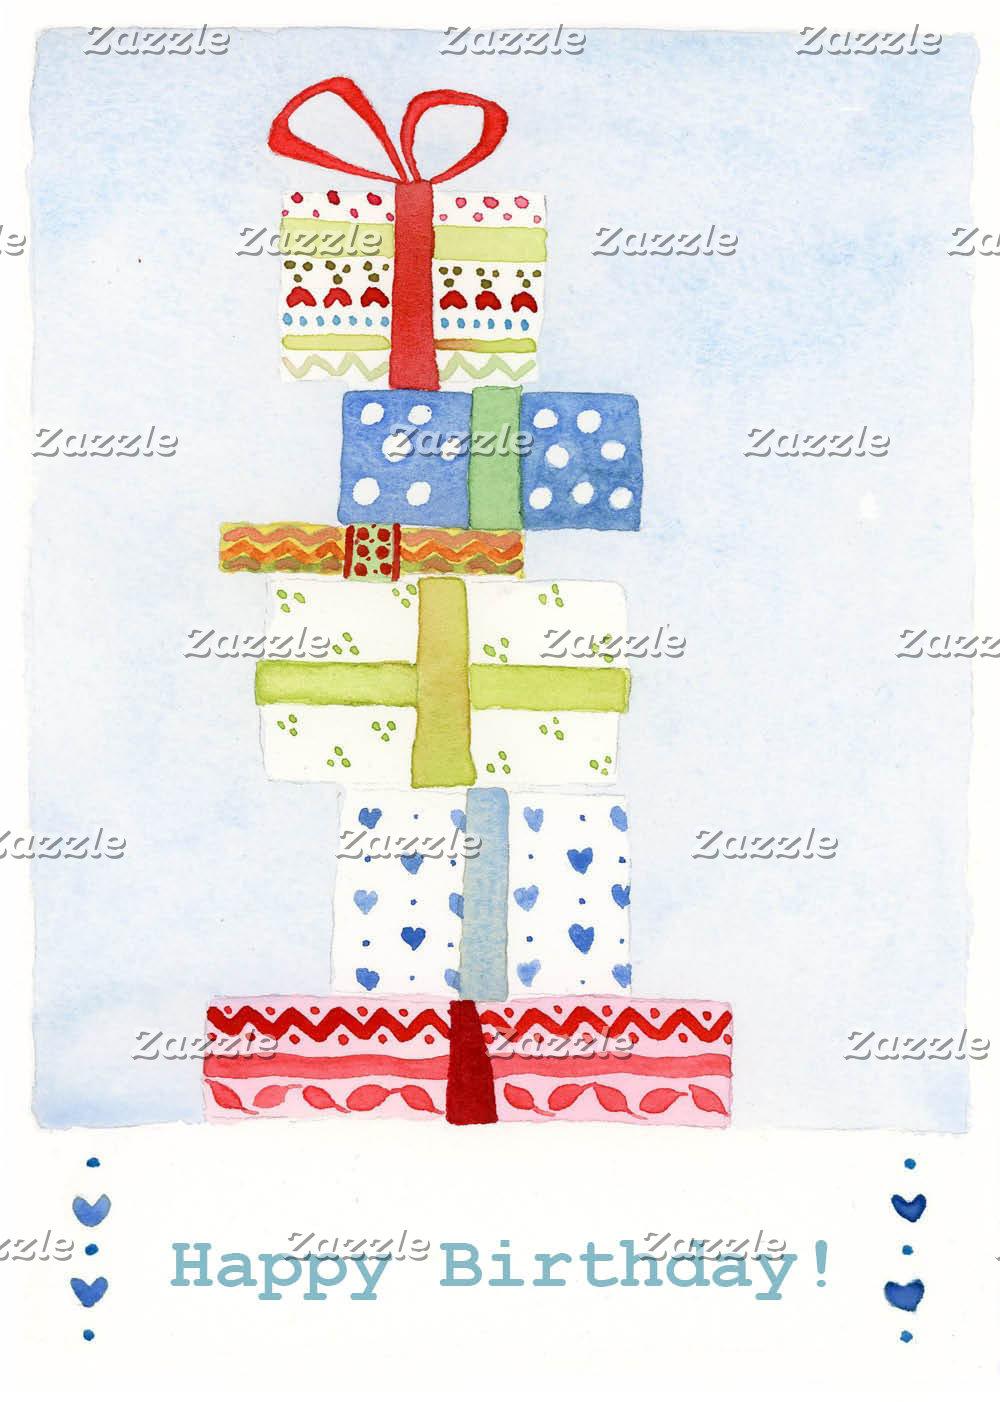 Cards - Birthday Cards